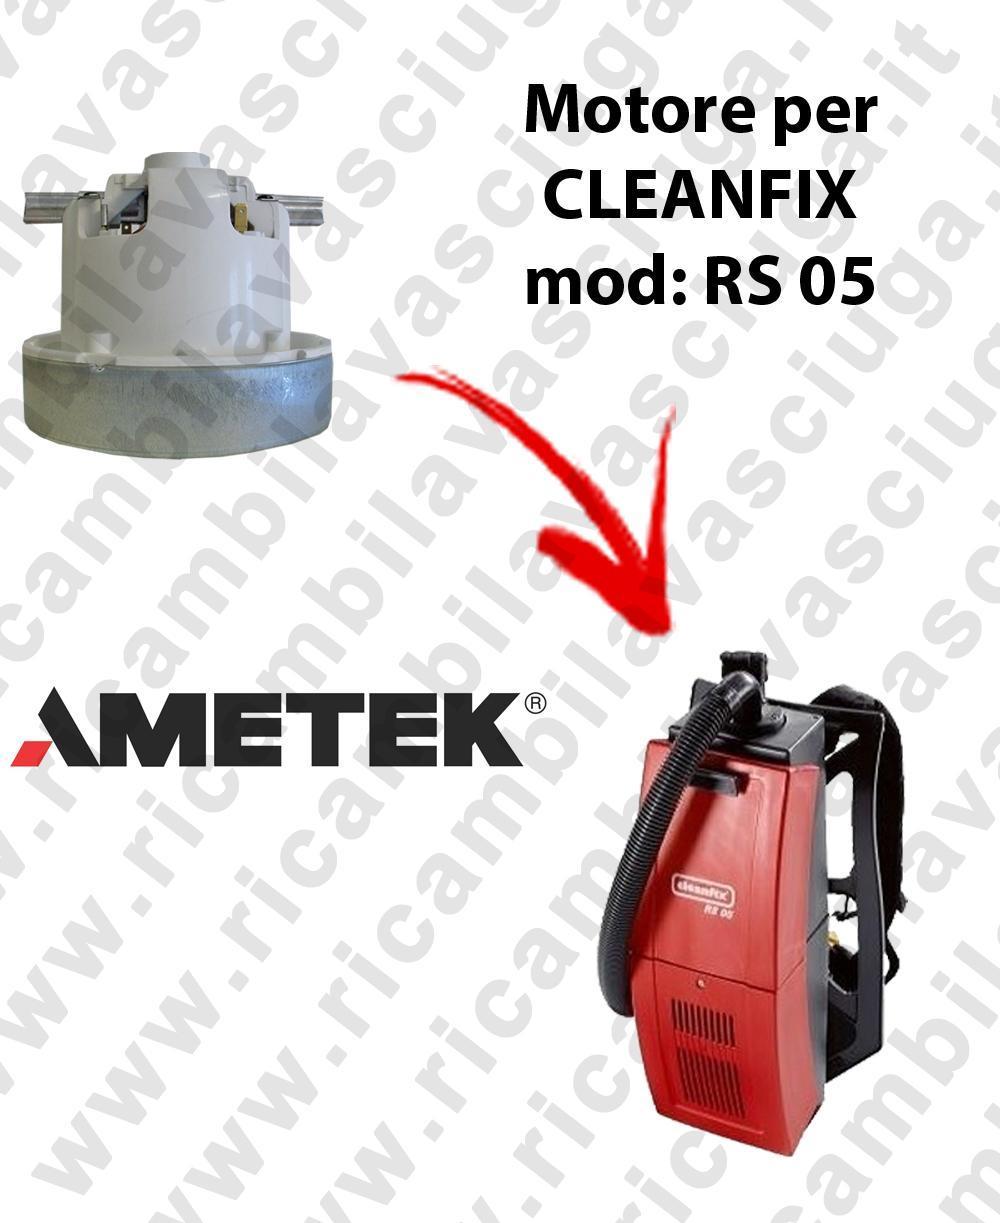 RS 05 Saugmotor AMETEK für Staubsauger CLEANFIX